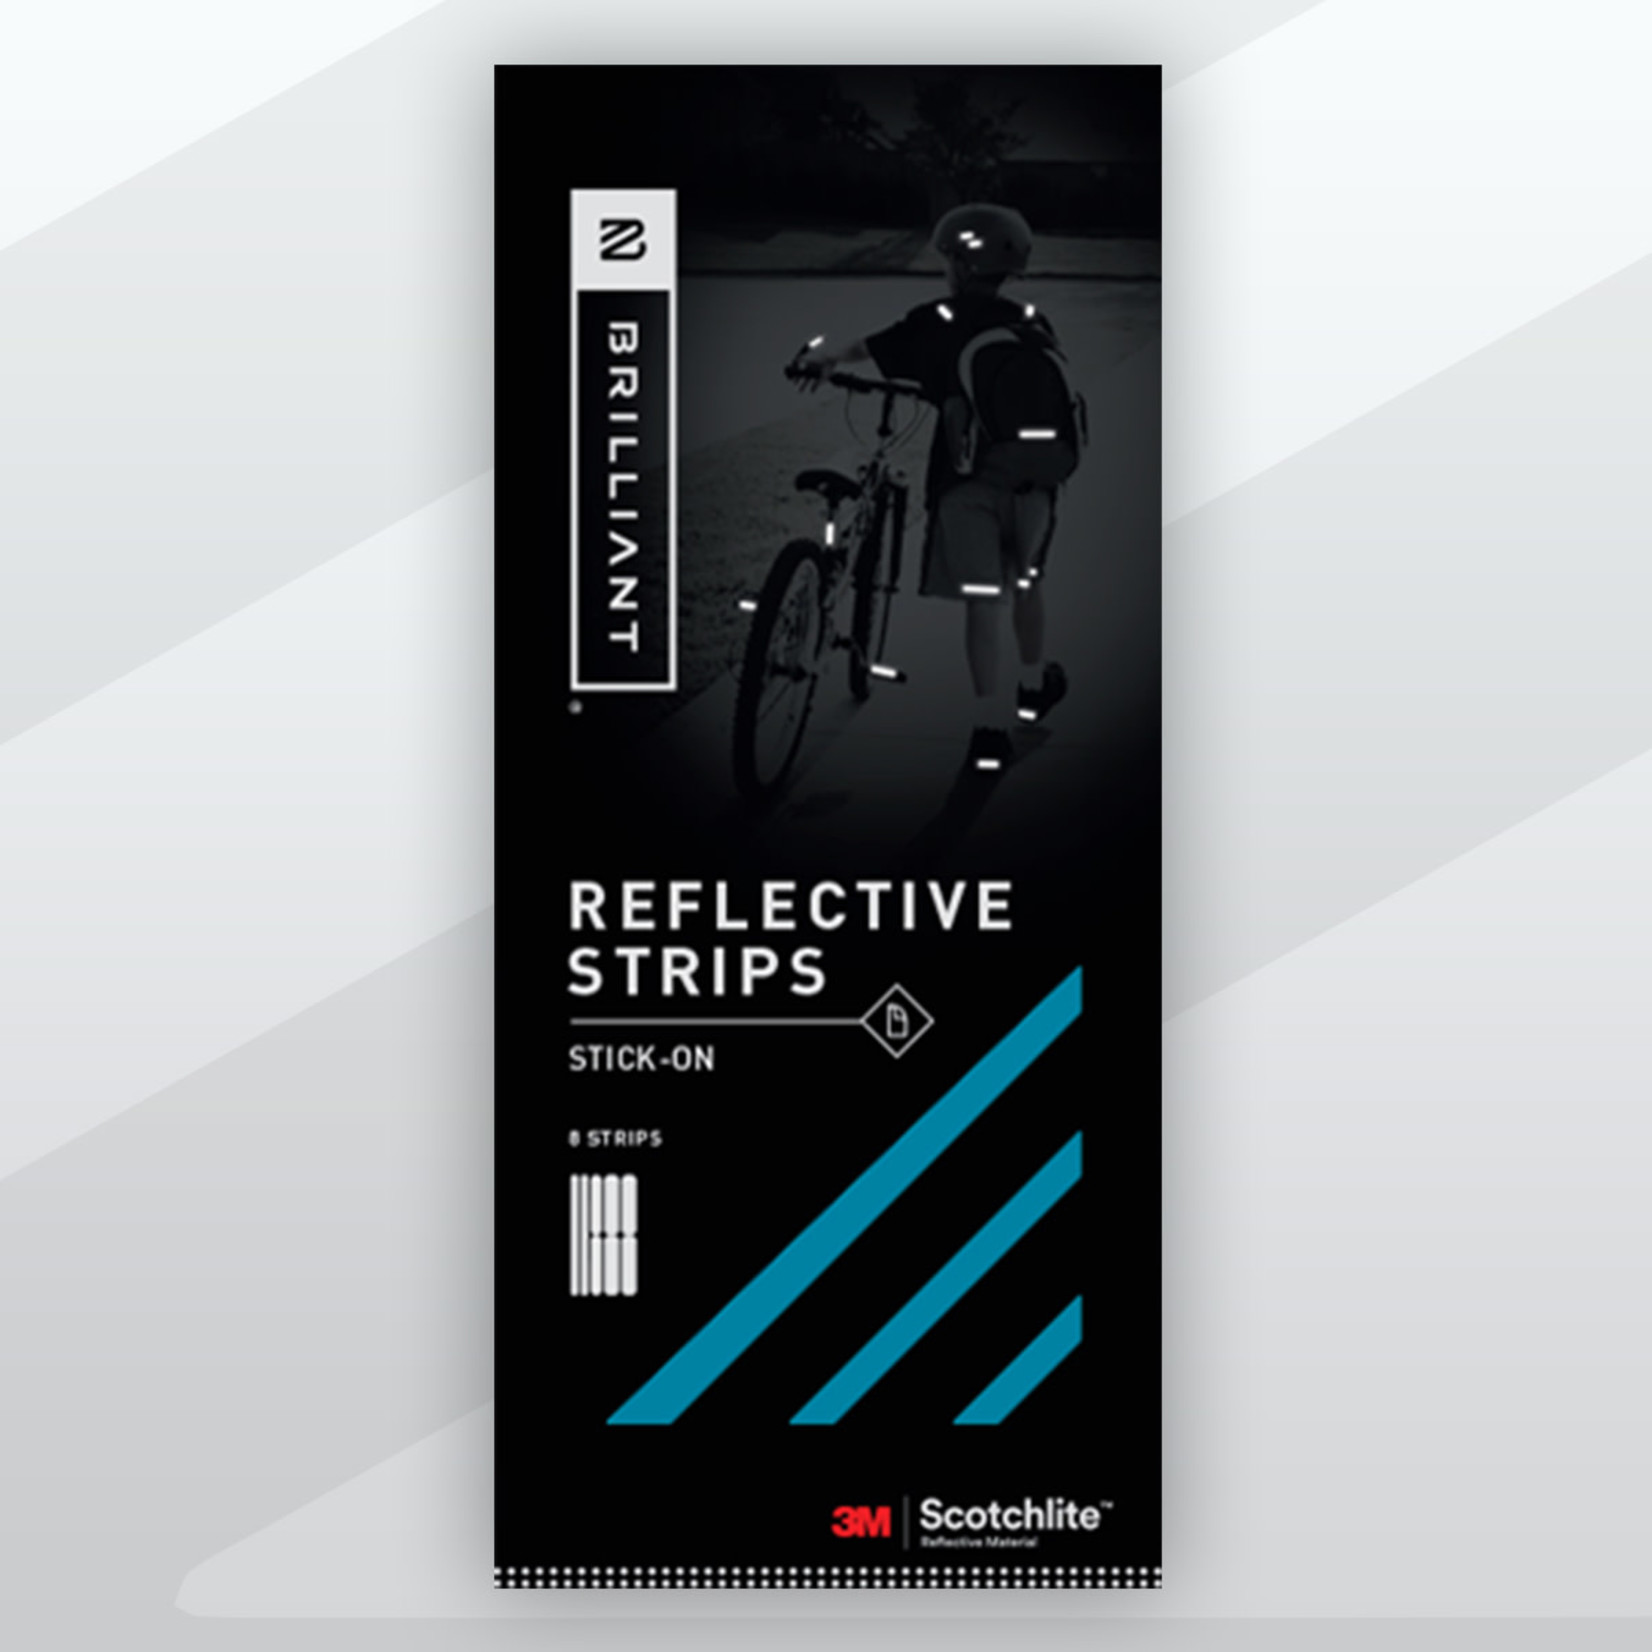 Brilliant Reflective Strips Stick-On